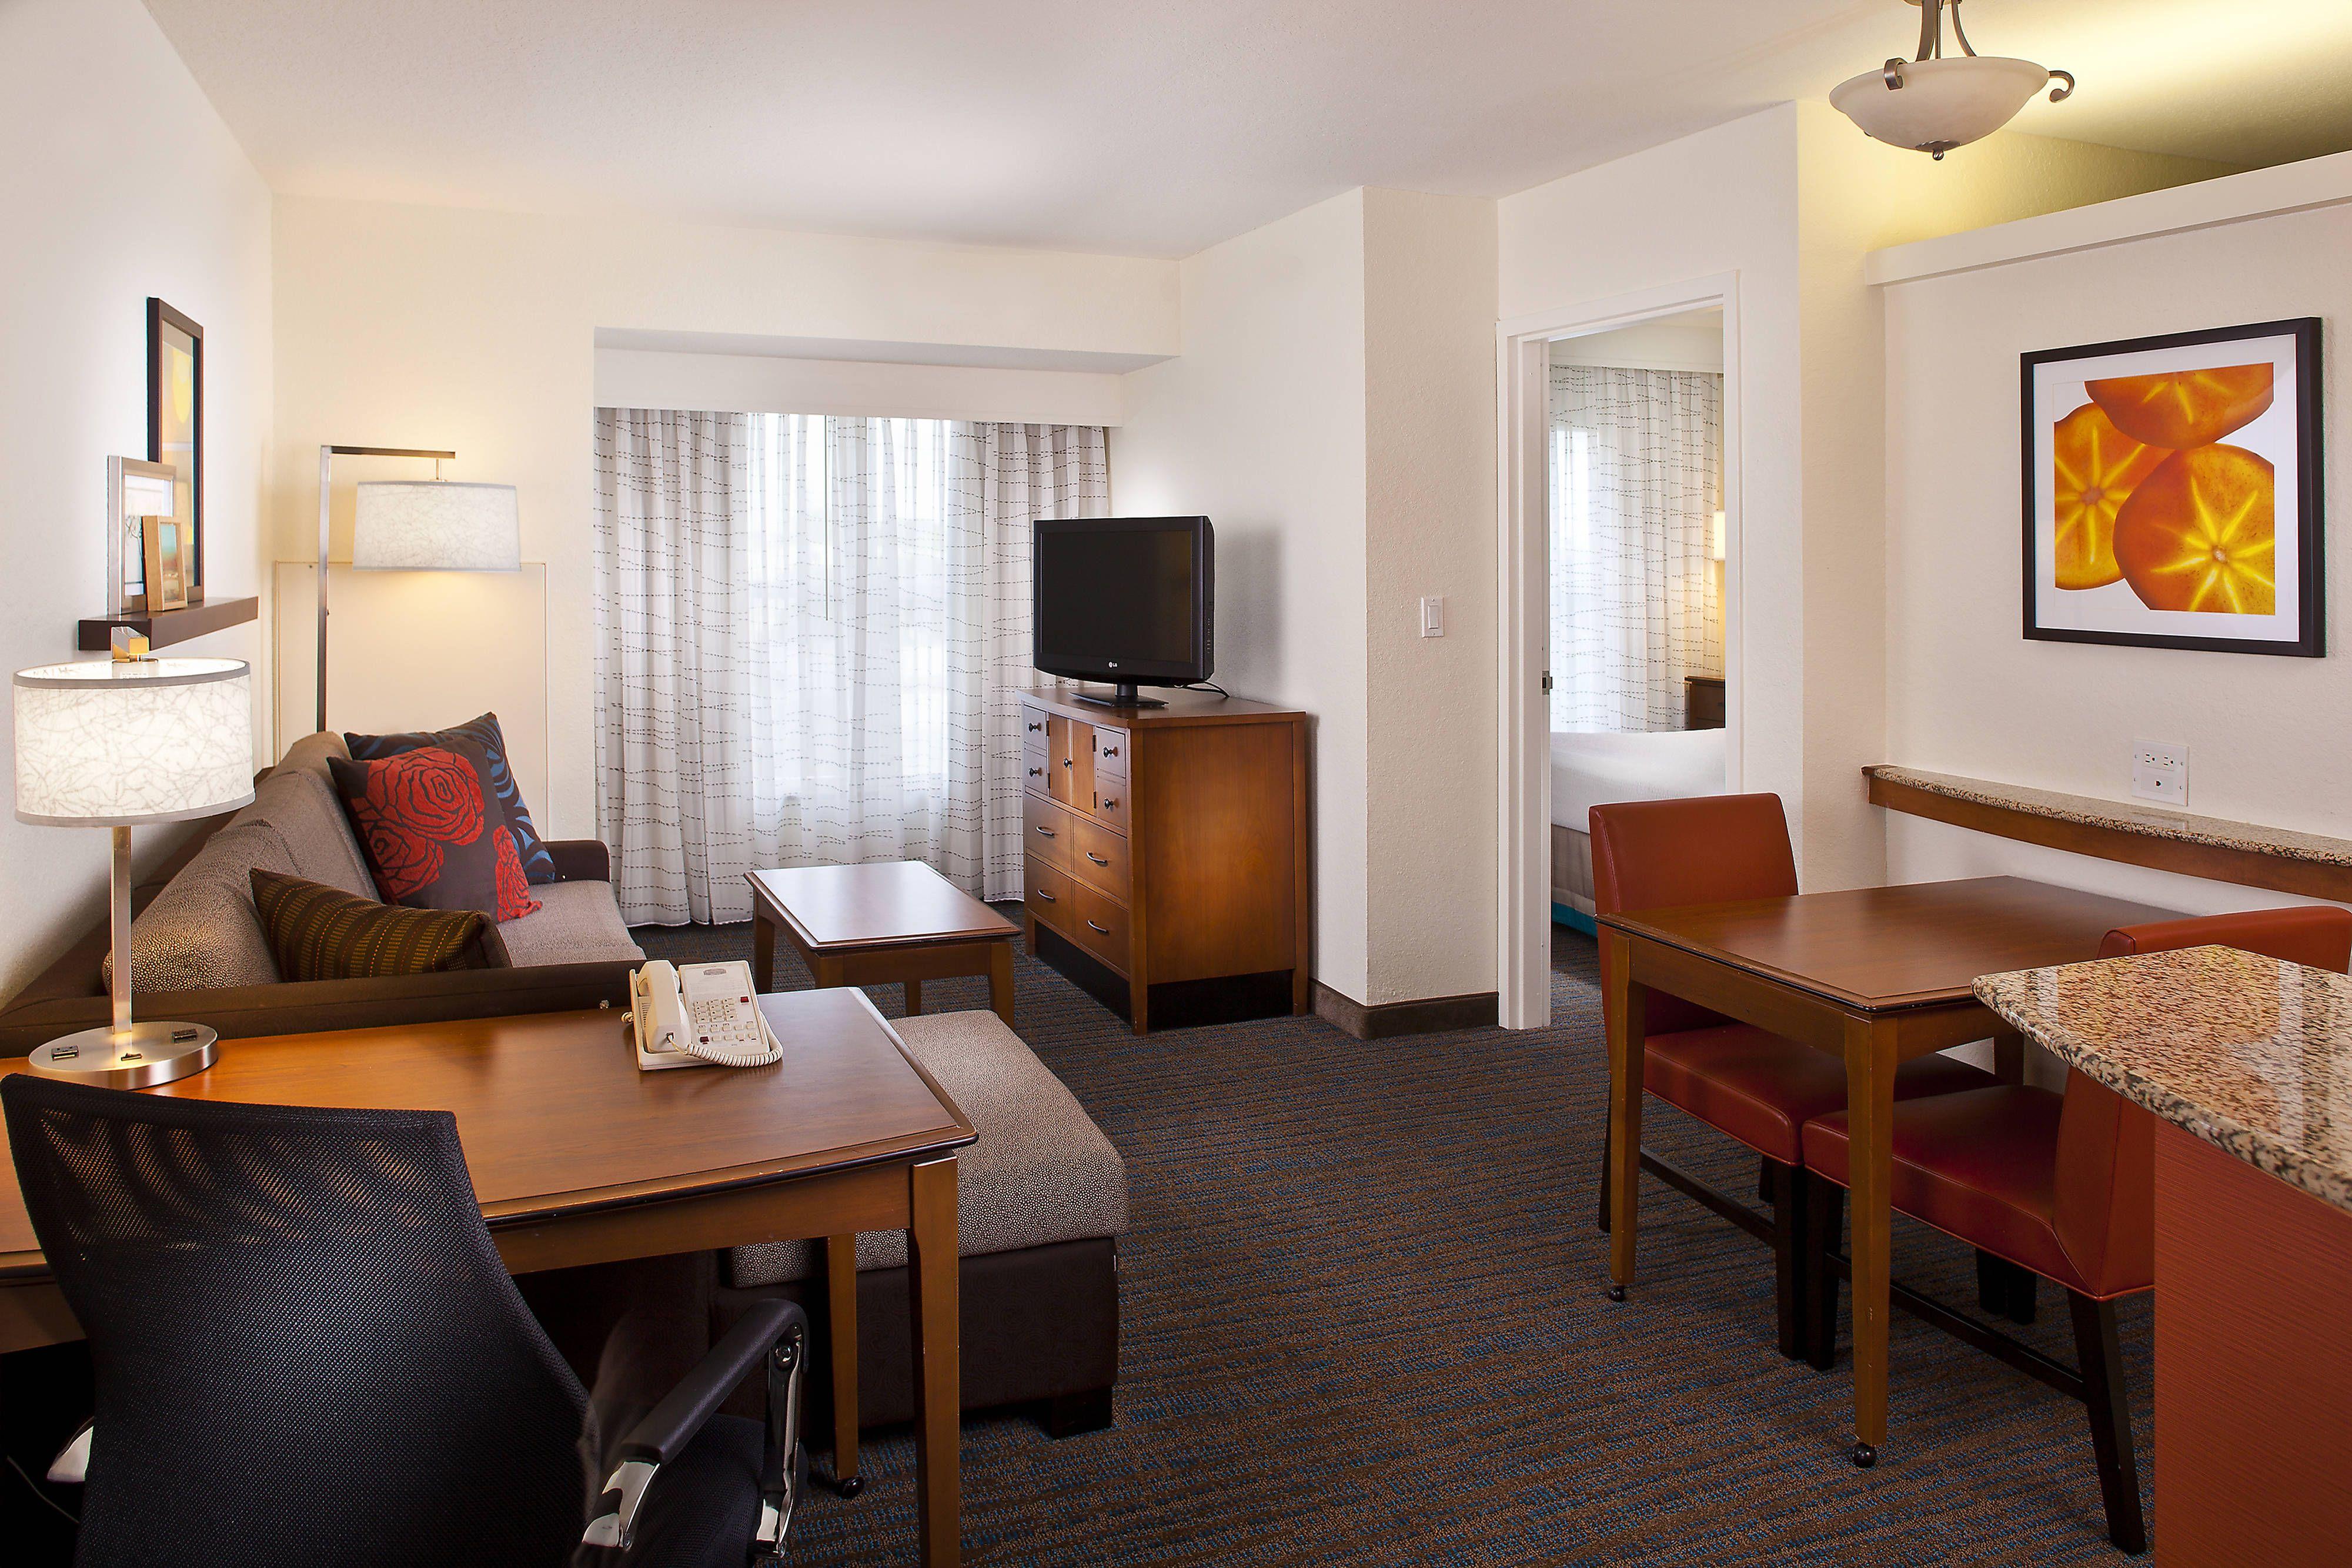 Residence Inn Daytona Beach Speedway Airport One Bedroom King Suite With Images Daytona Beach Hotels Daytona Beach Residences